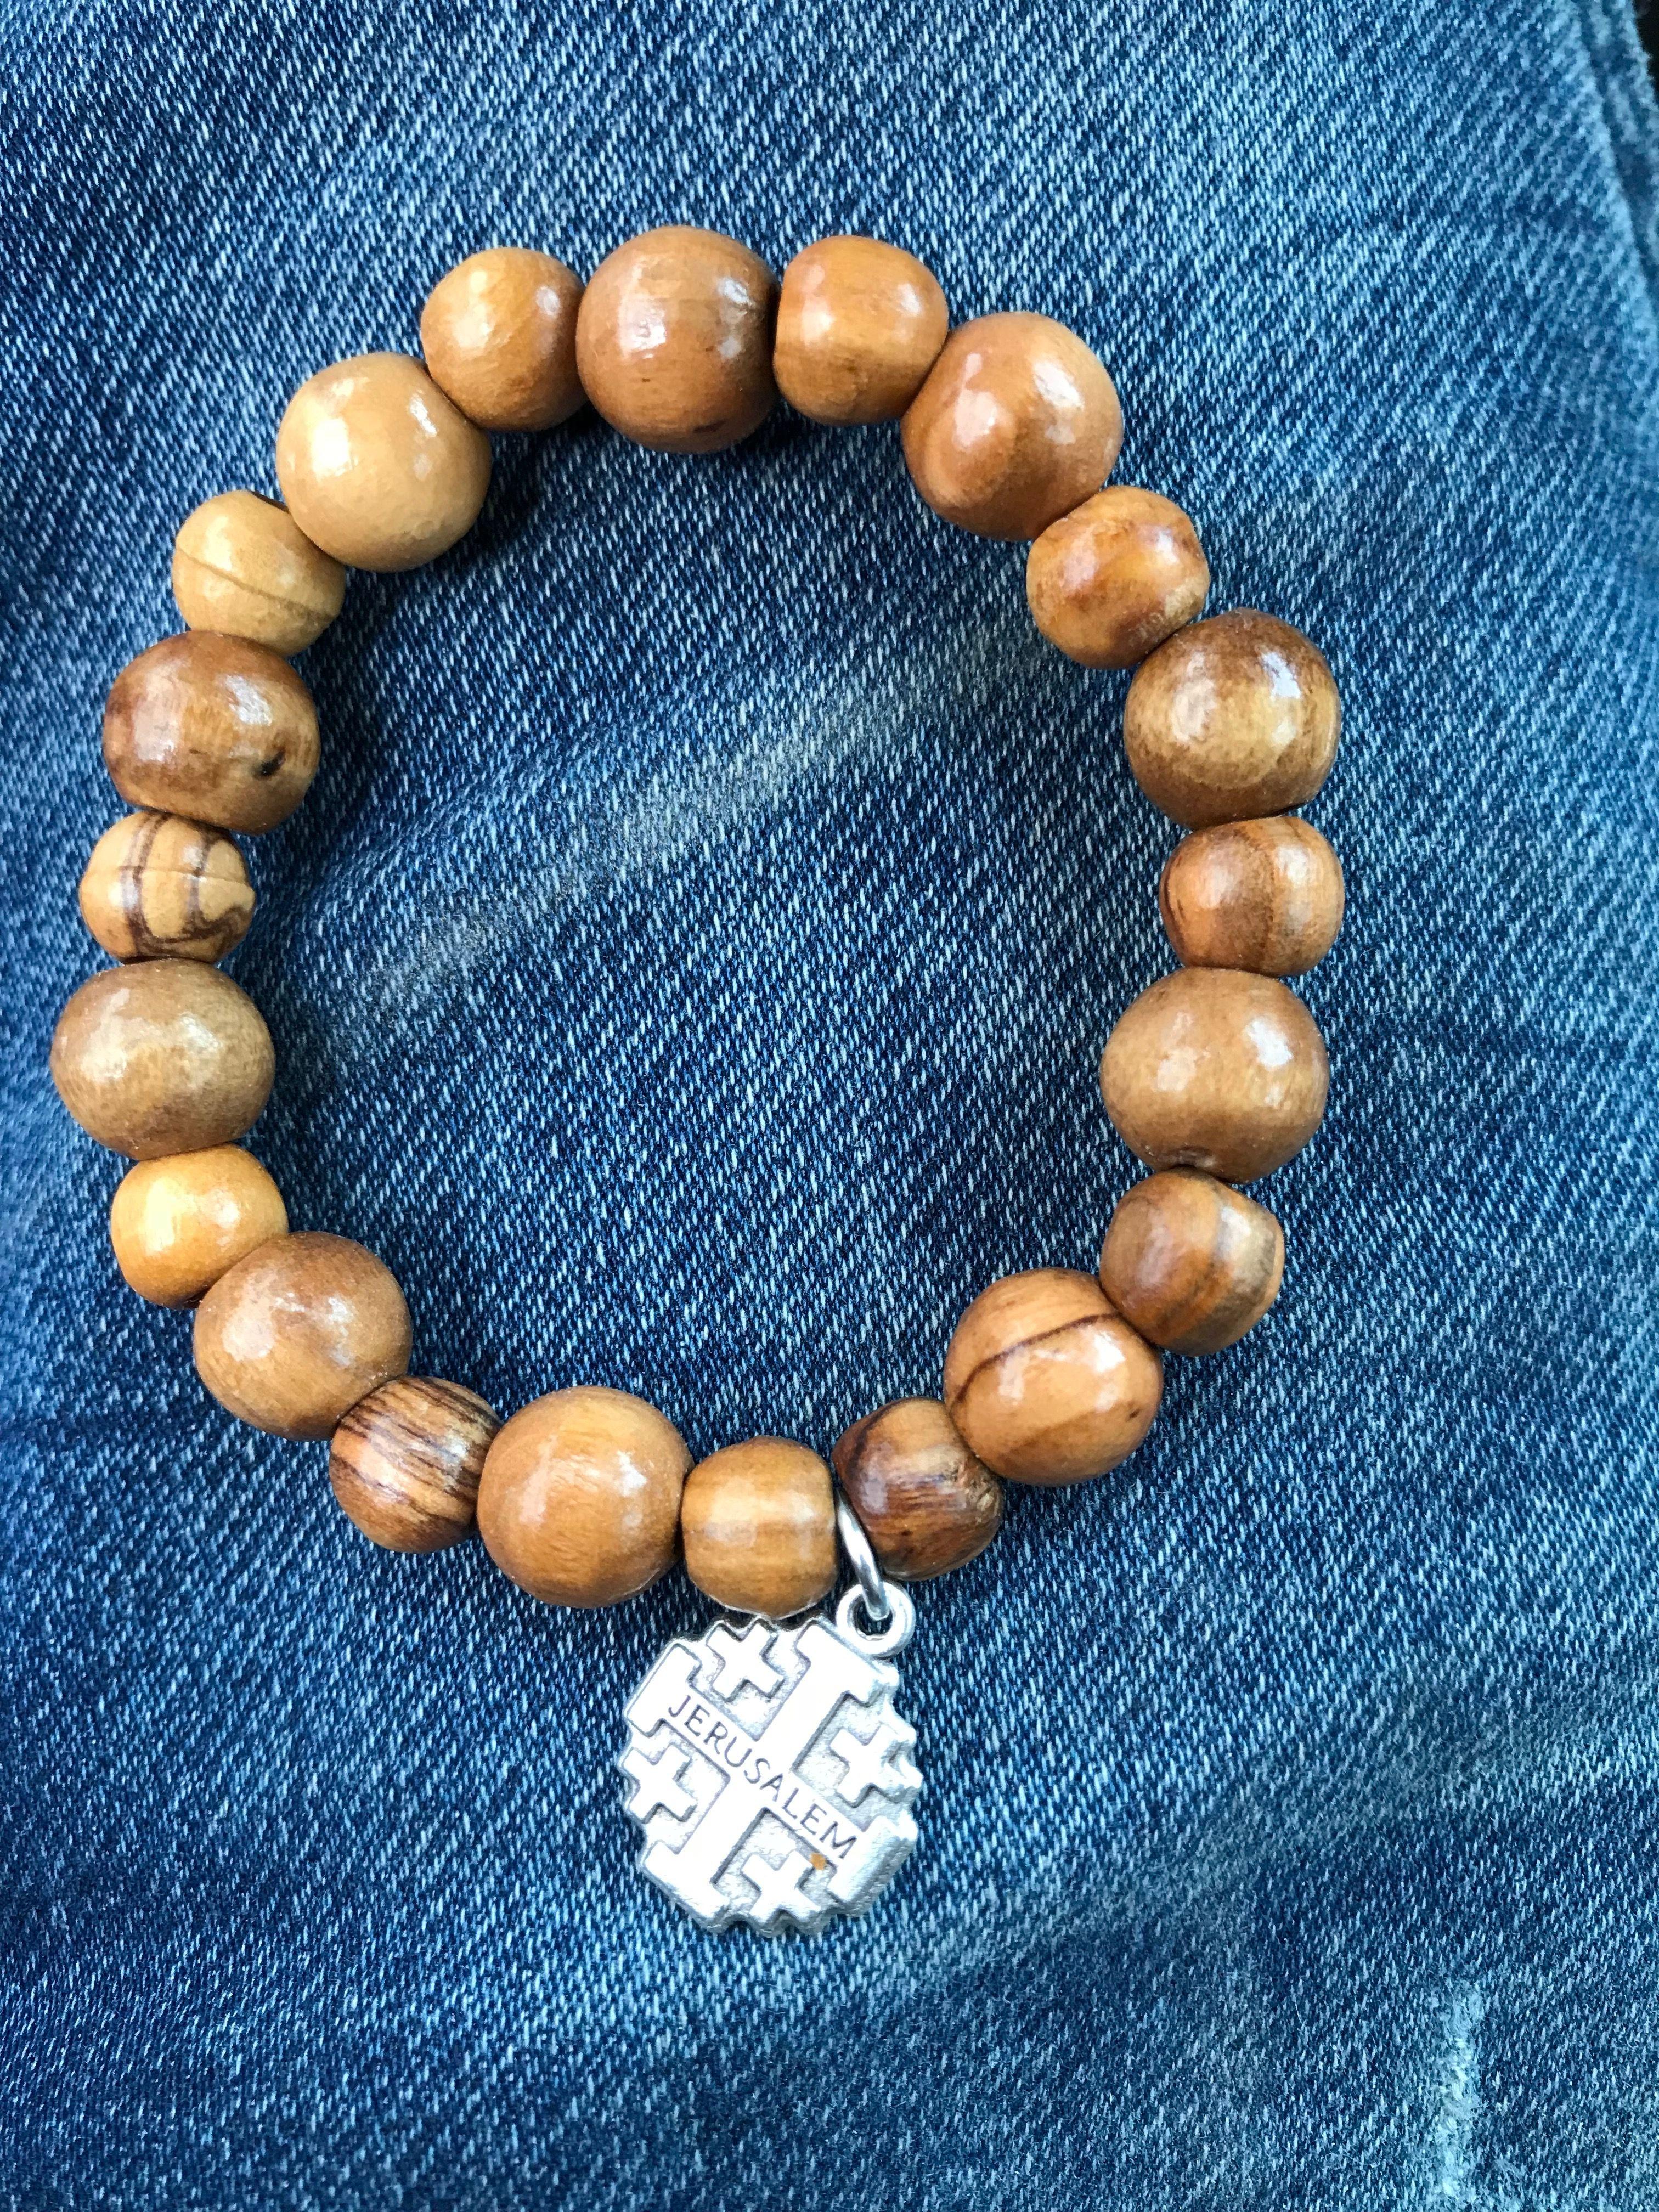 Pin by Kym K on Art, craft, home, fun Beaded bracelets